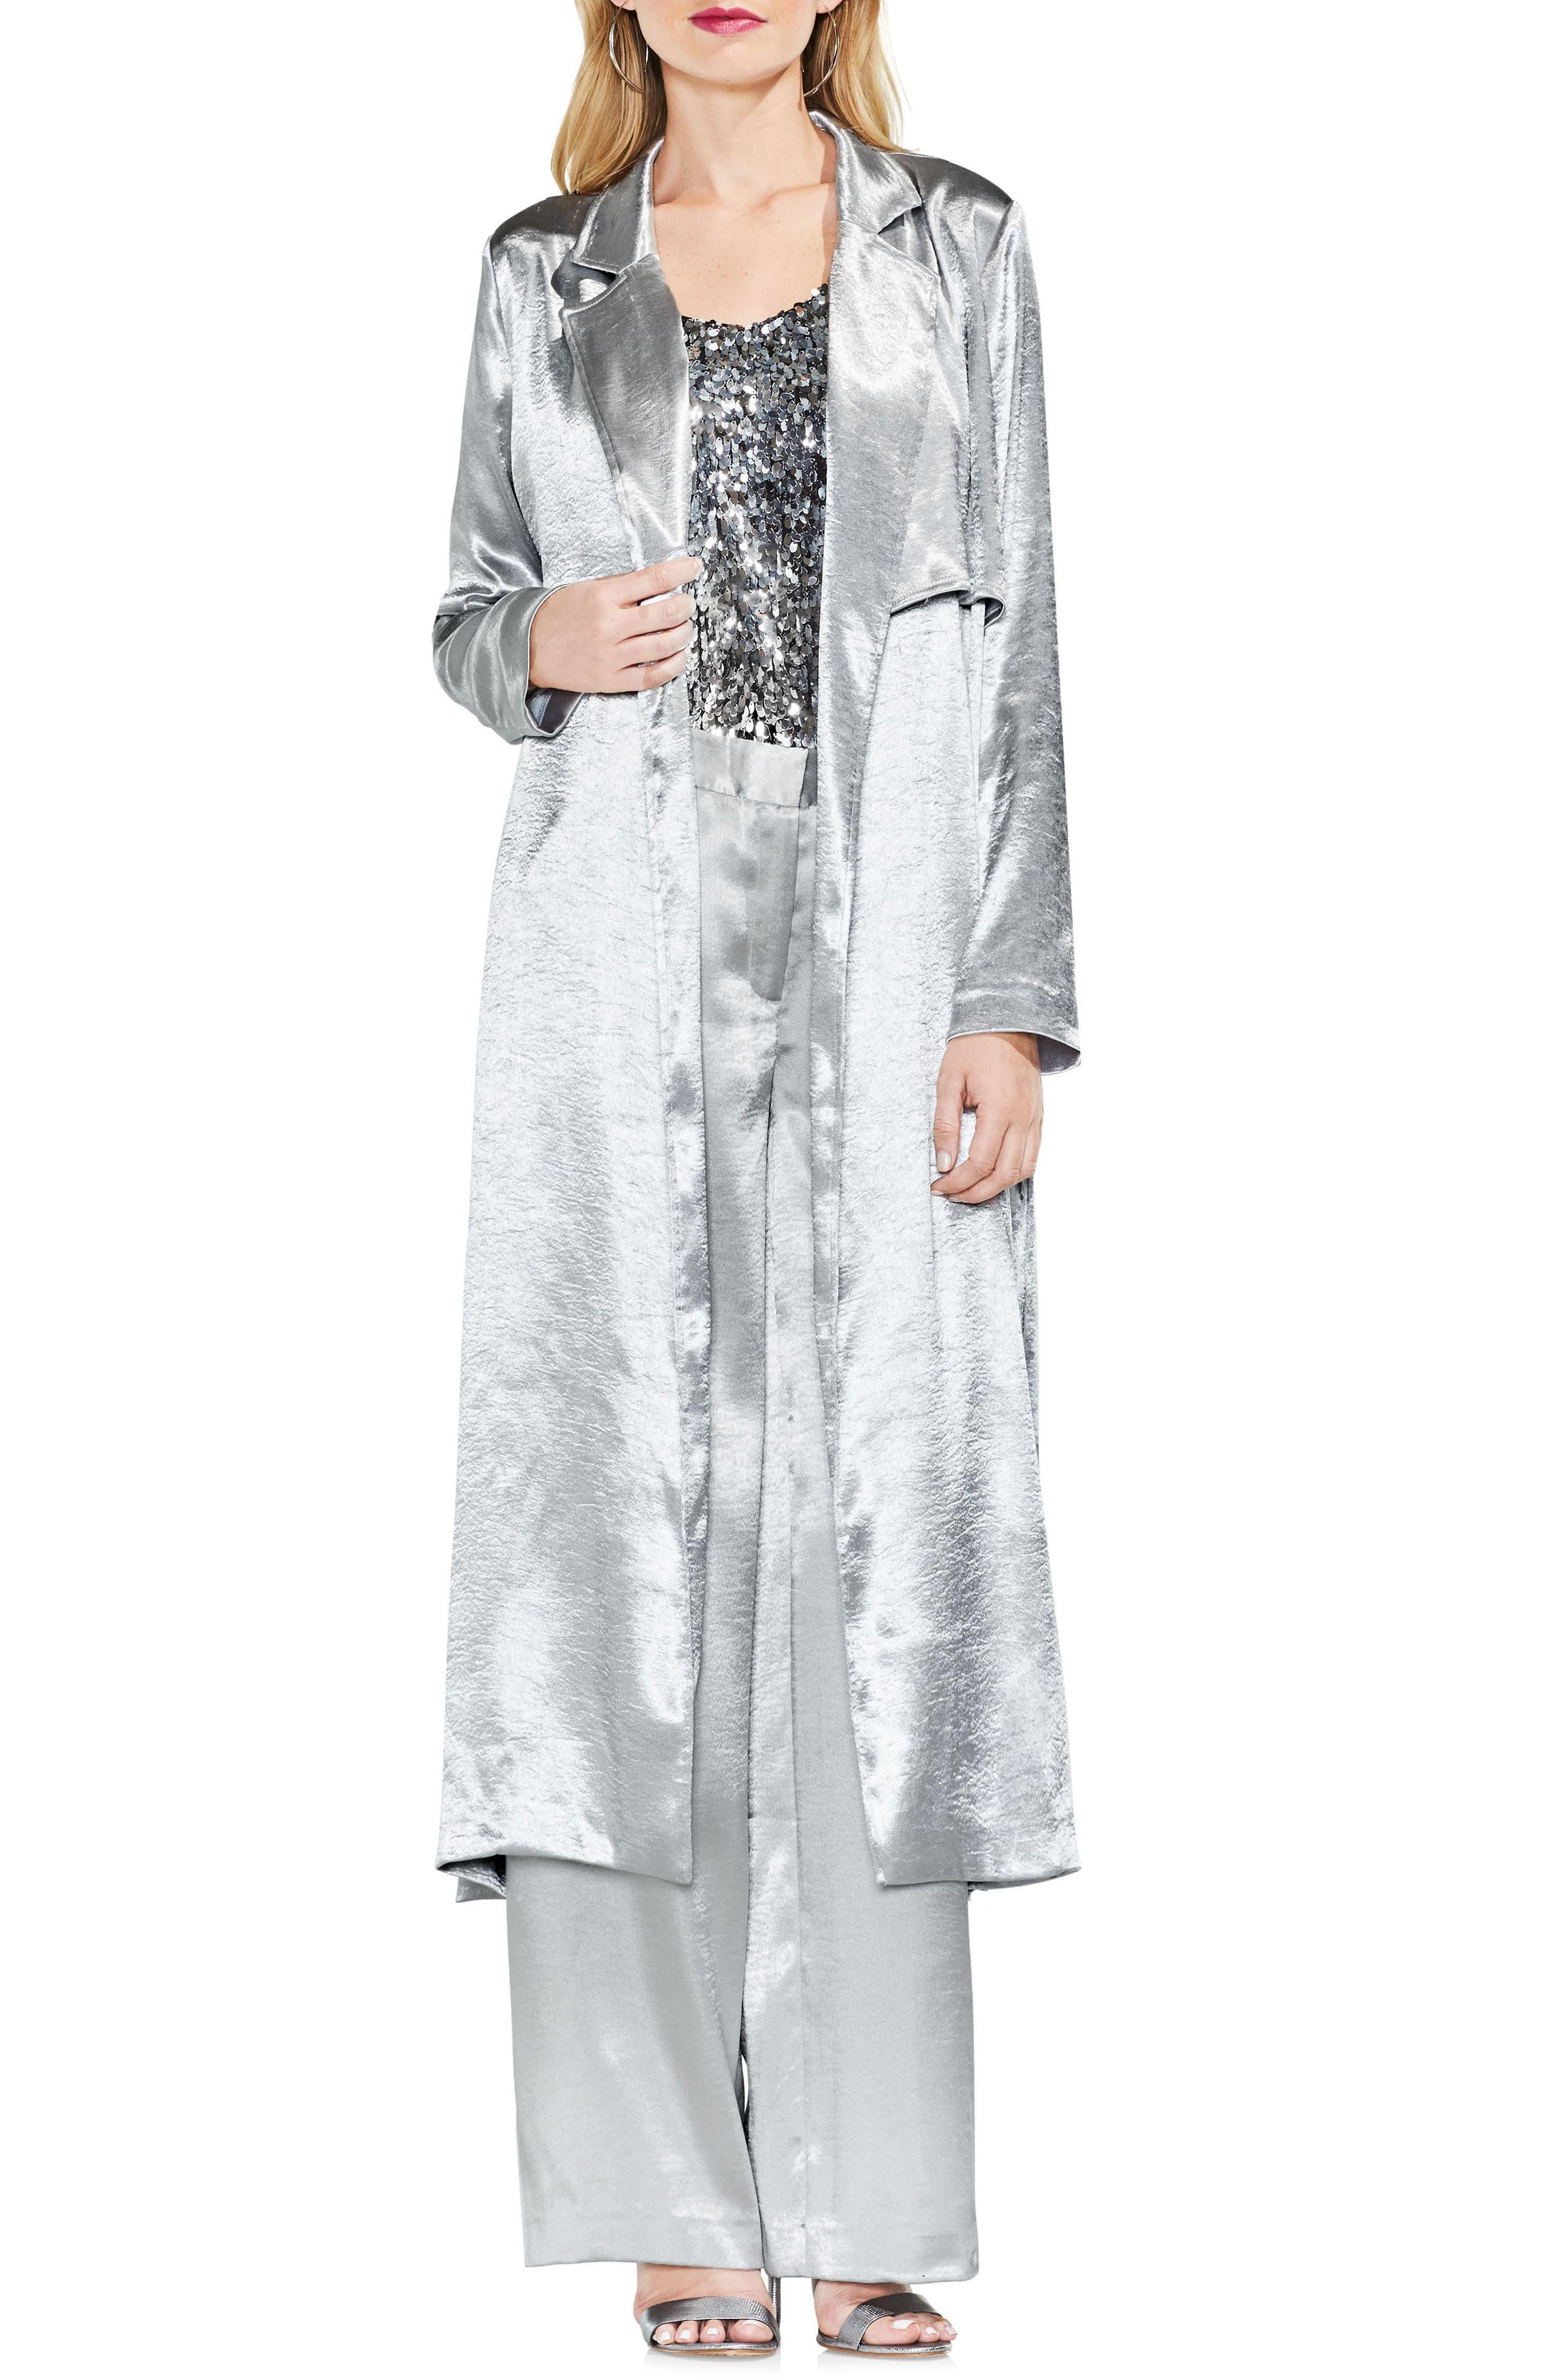 Rumple Satin Trench Coat,                         Main,                         color, Silver Mink